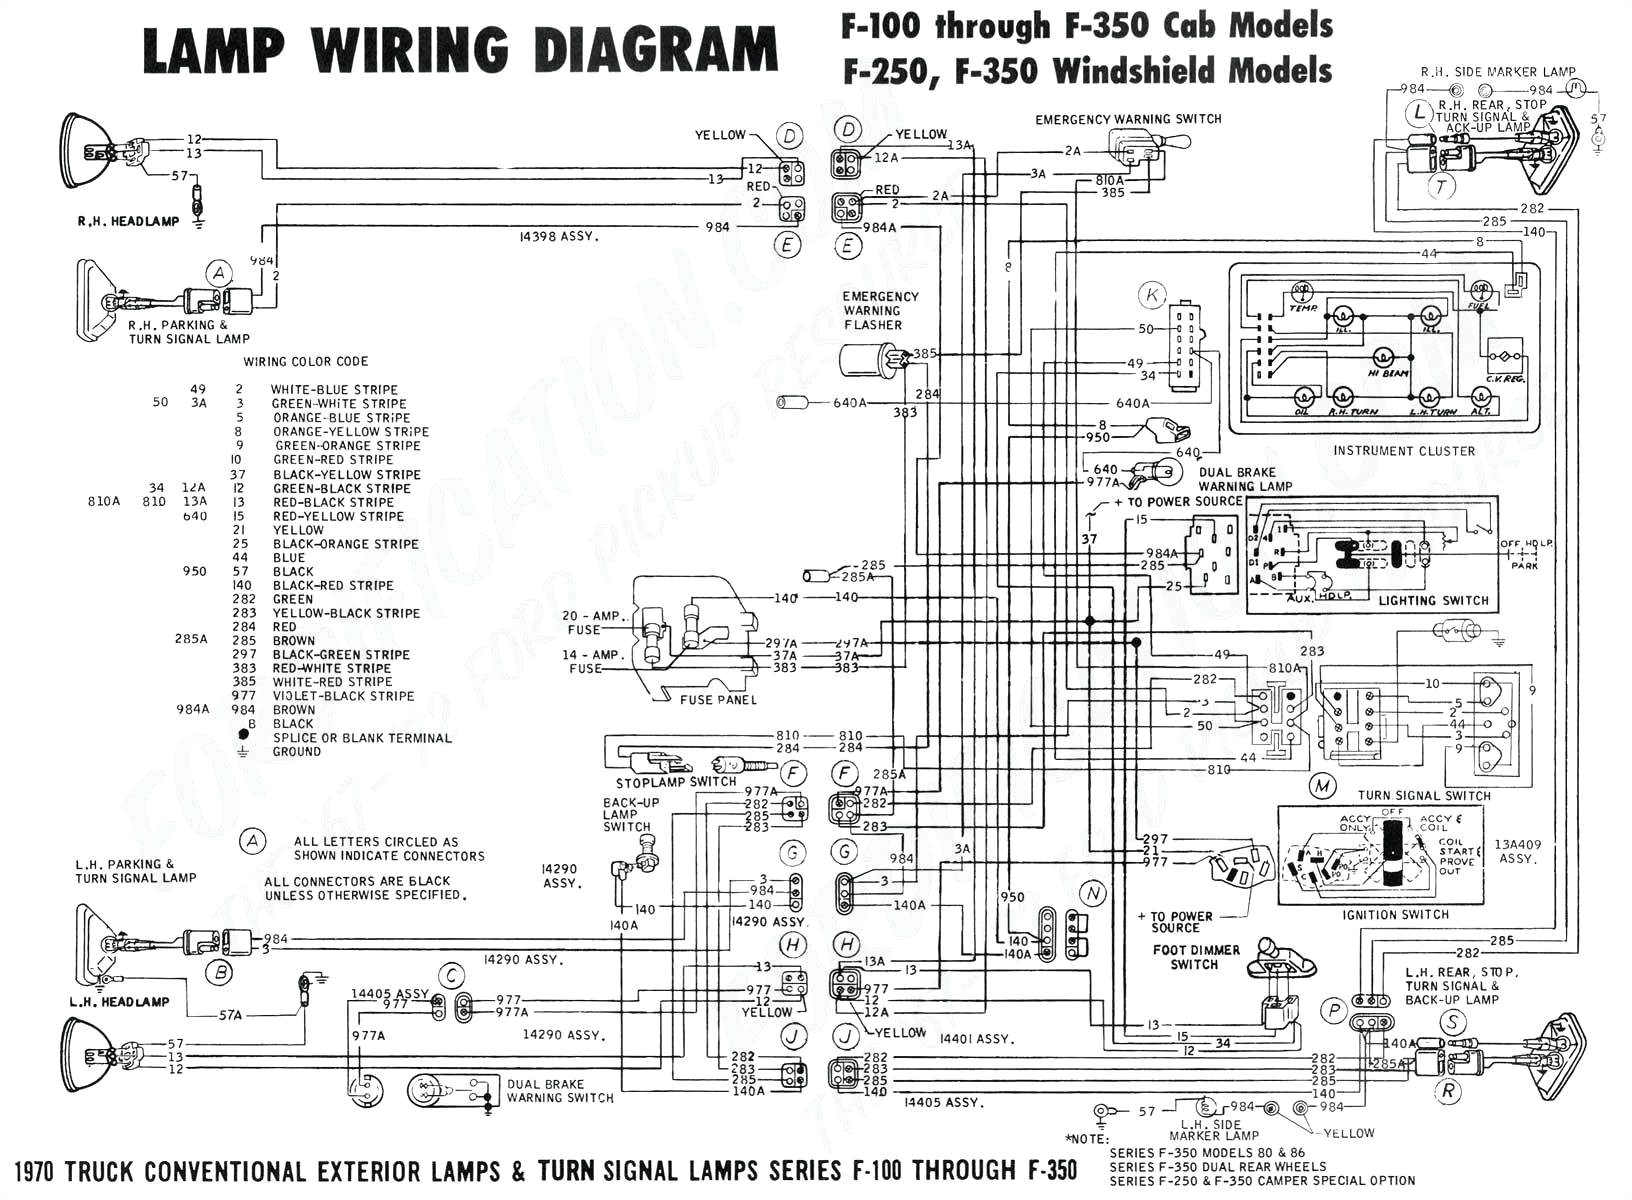 watt stopper relay control panel wiring diagrams wiring diagram local watt stopper dimming wiring diagram